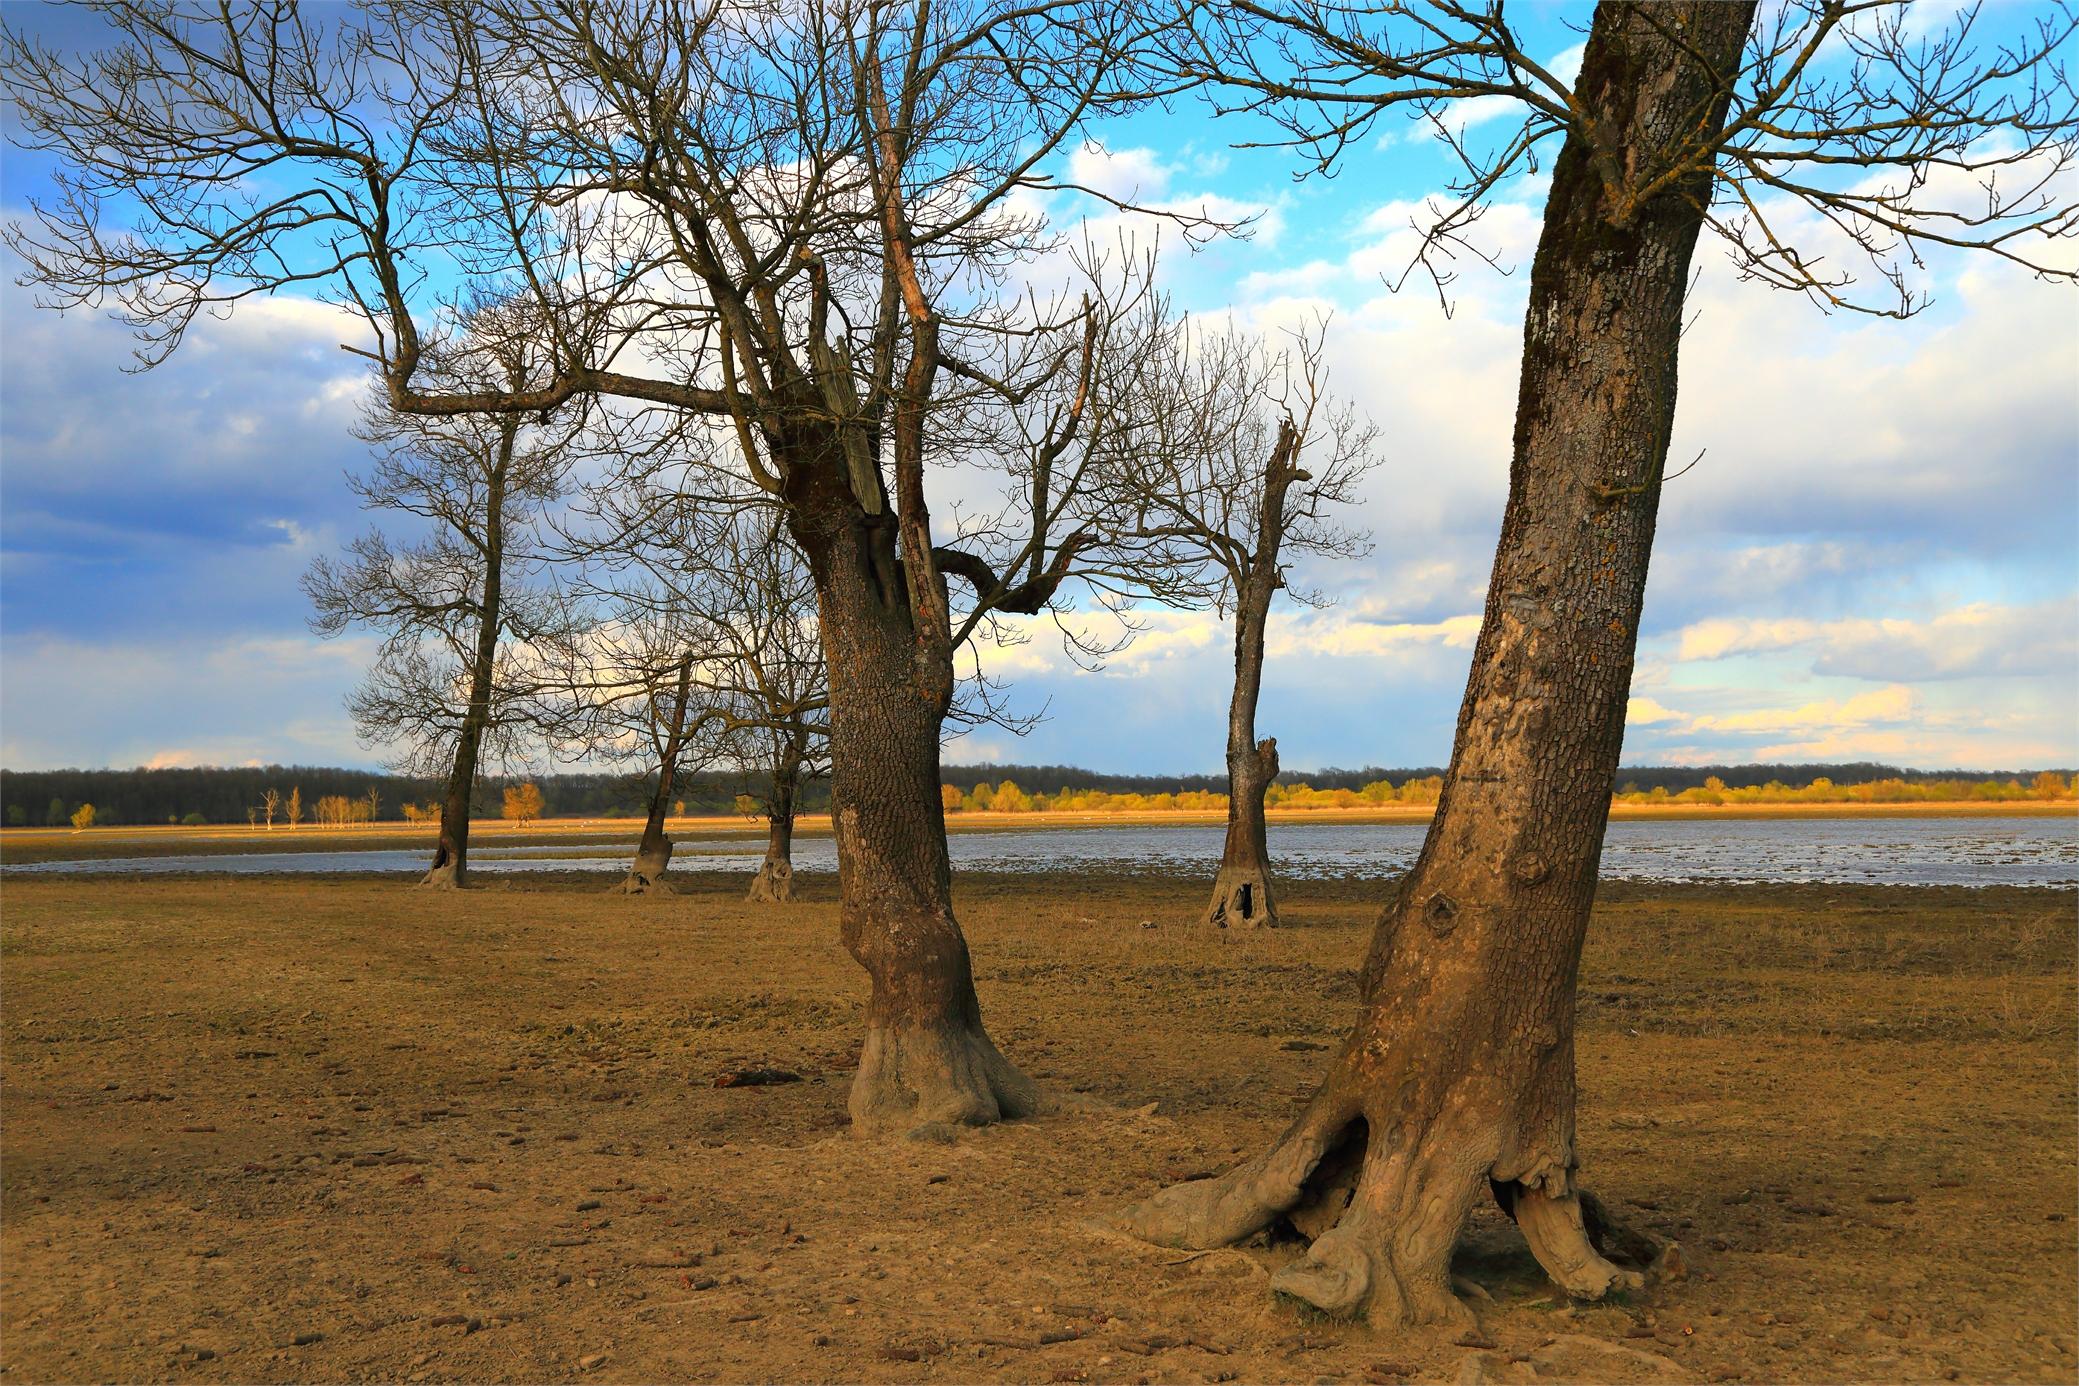 Wallpaper : park, trees, nature, Croatia, birdwatching, Hrvatska